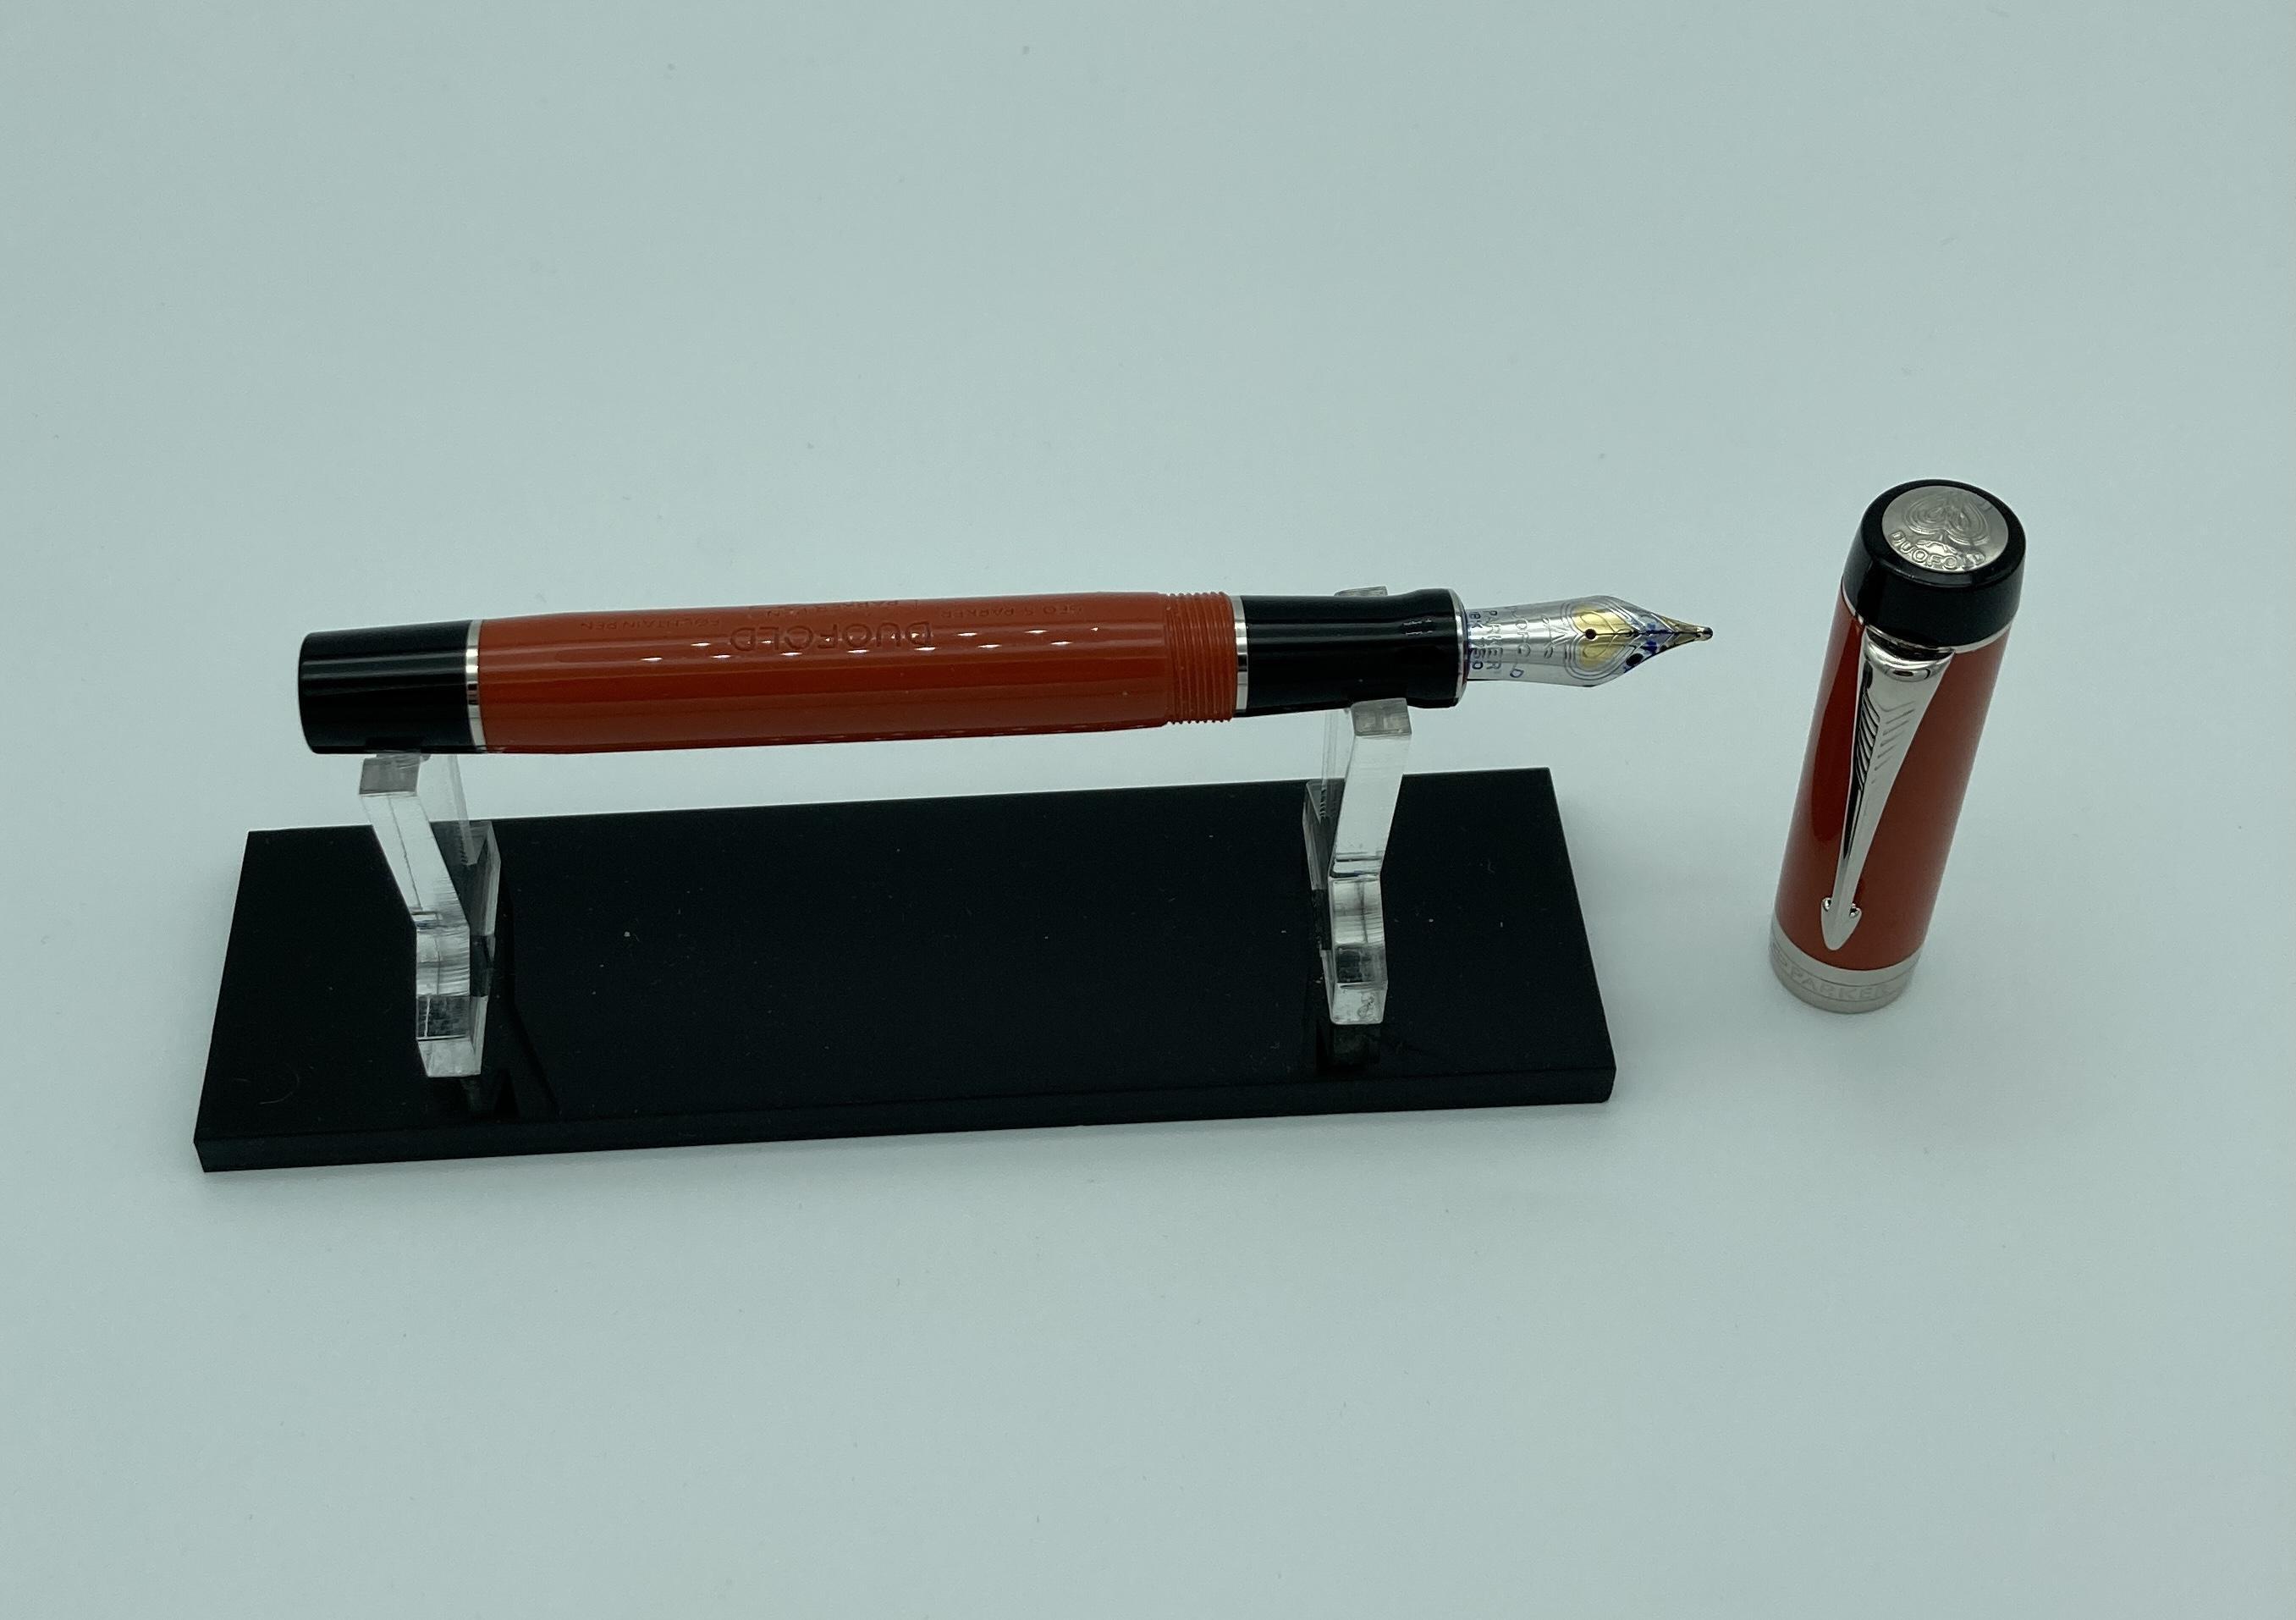 Pens and Pencils: : Parker: Duofold Centennial